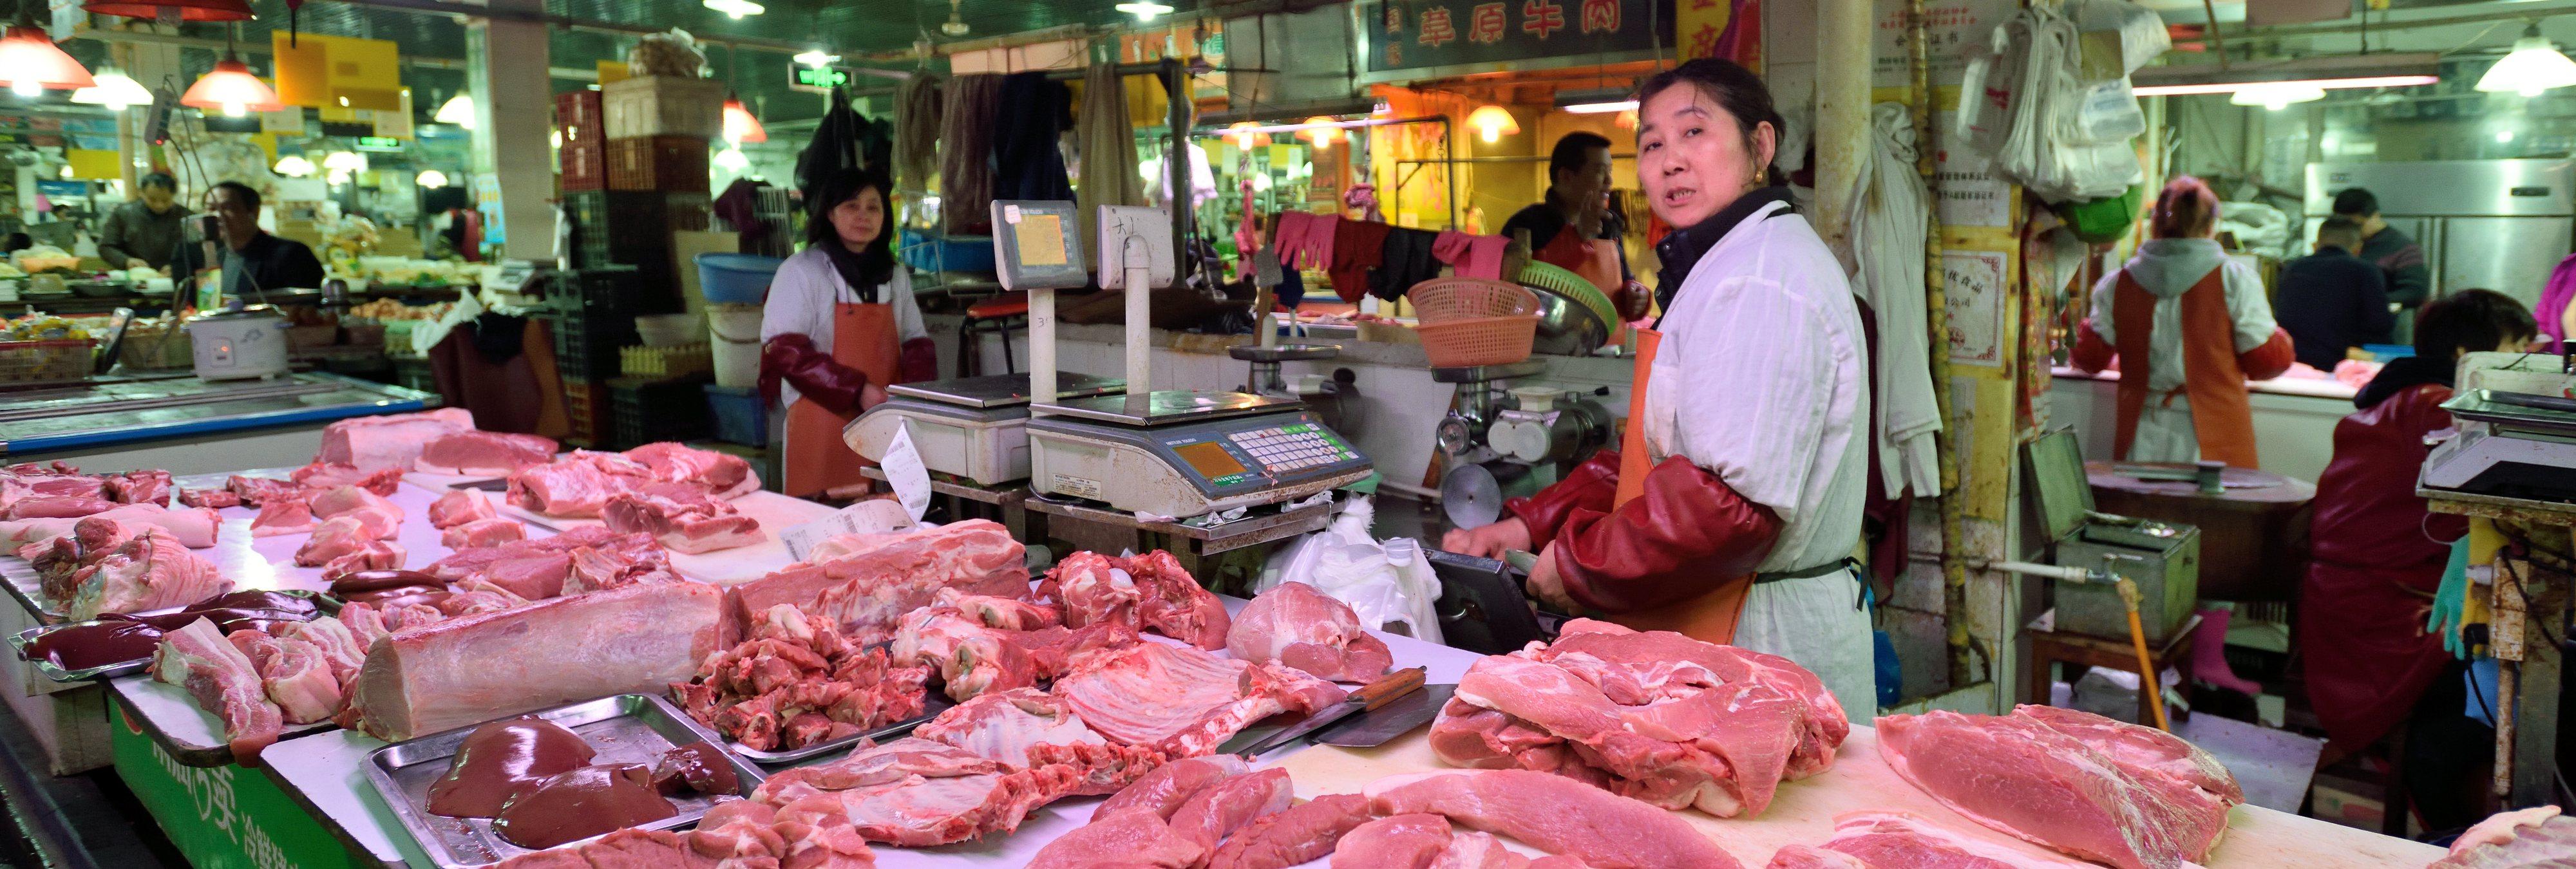 China cría cerdos gigantes con forma de oso polar para cubrir sus necesidades de carne